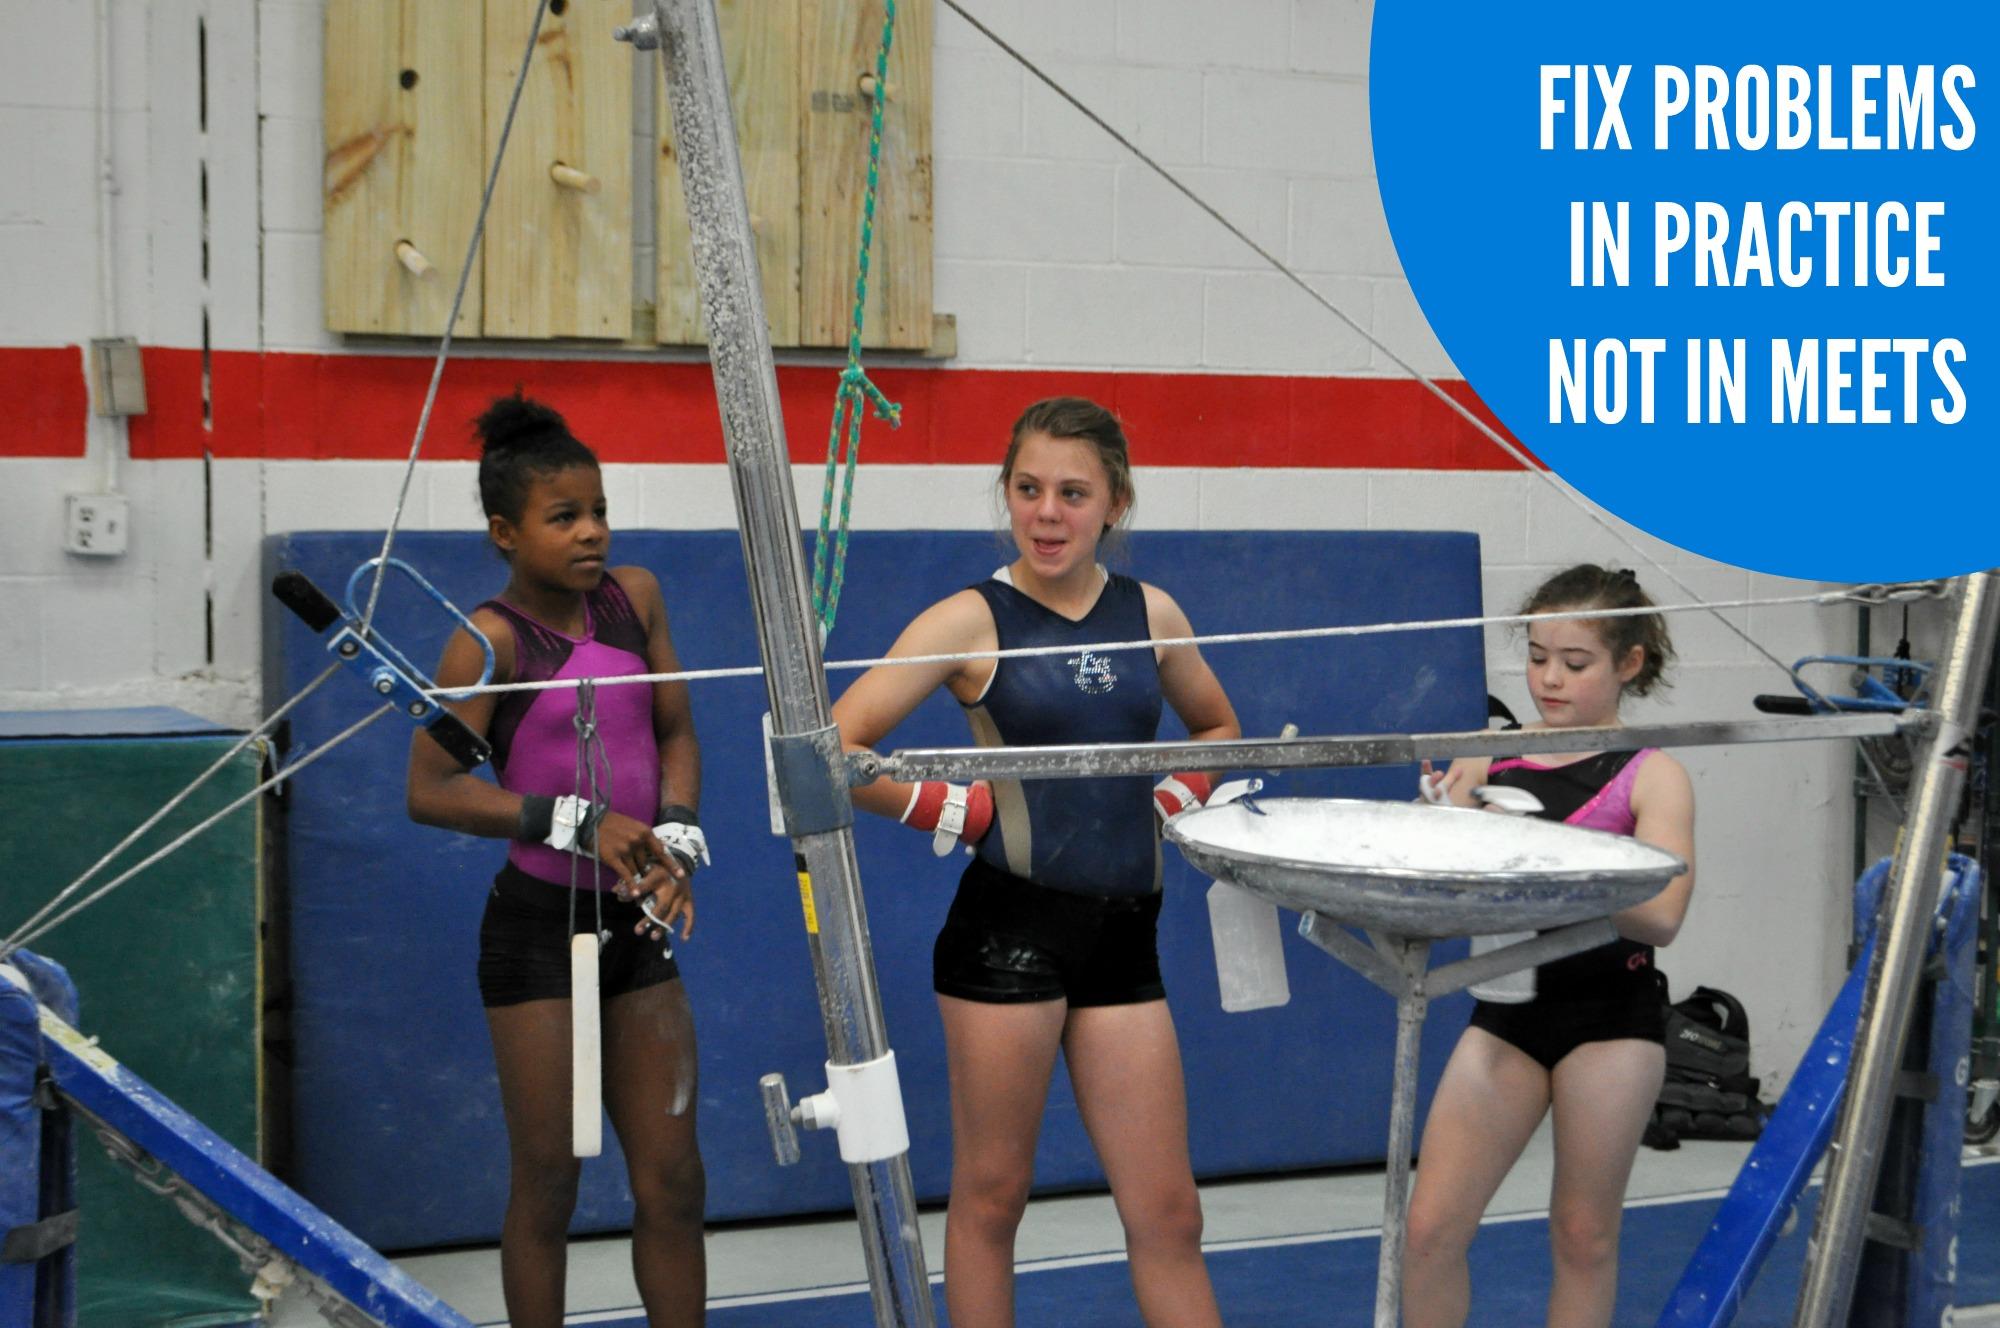 Fix problems in practice not in meets